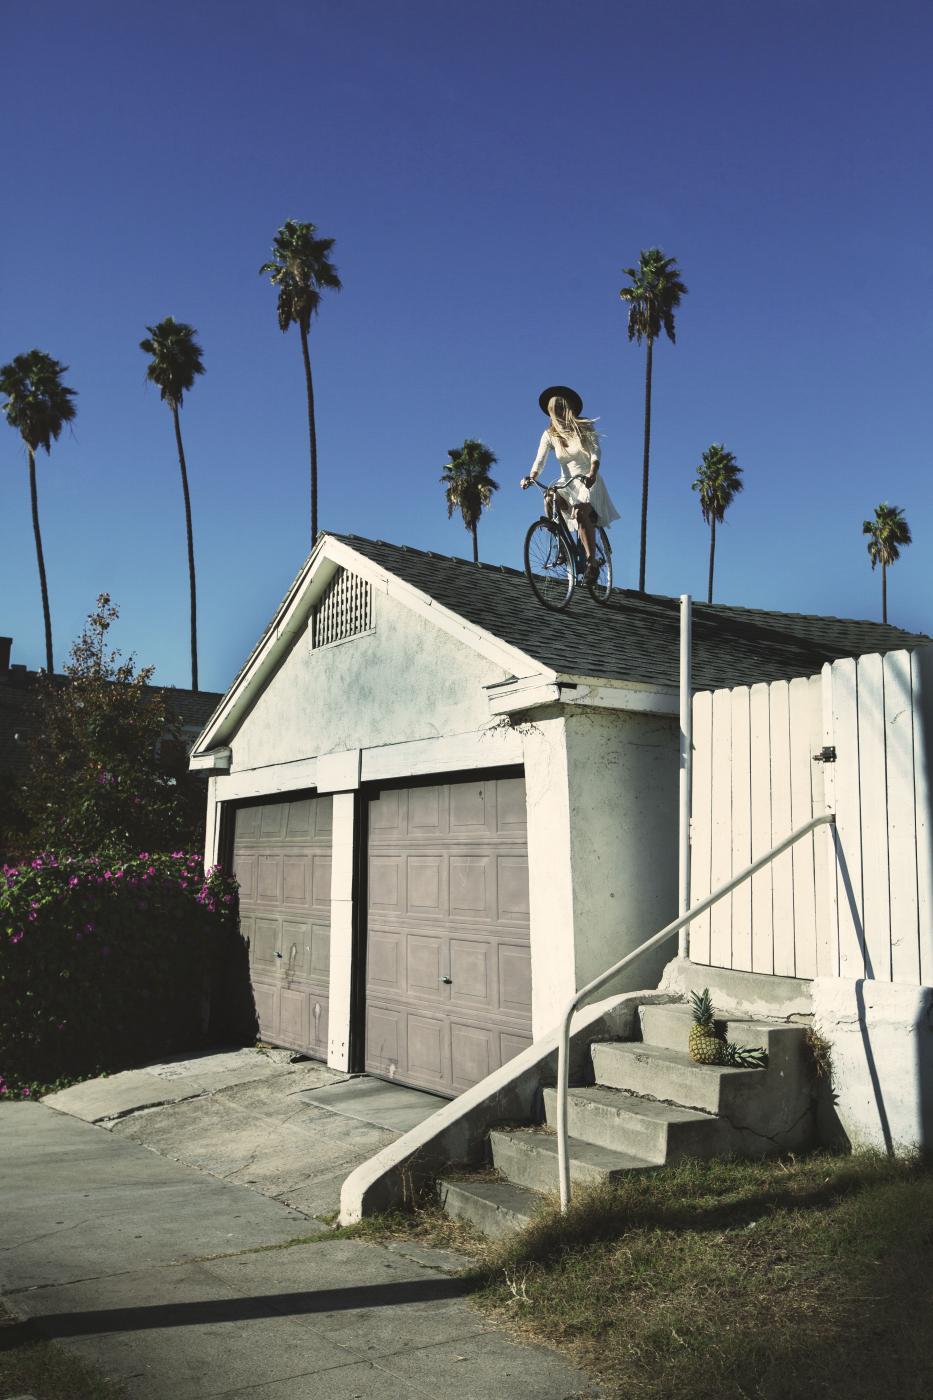 Jordan_bike roof_test6